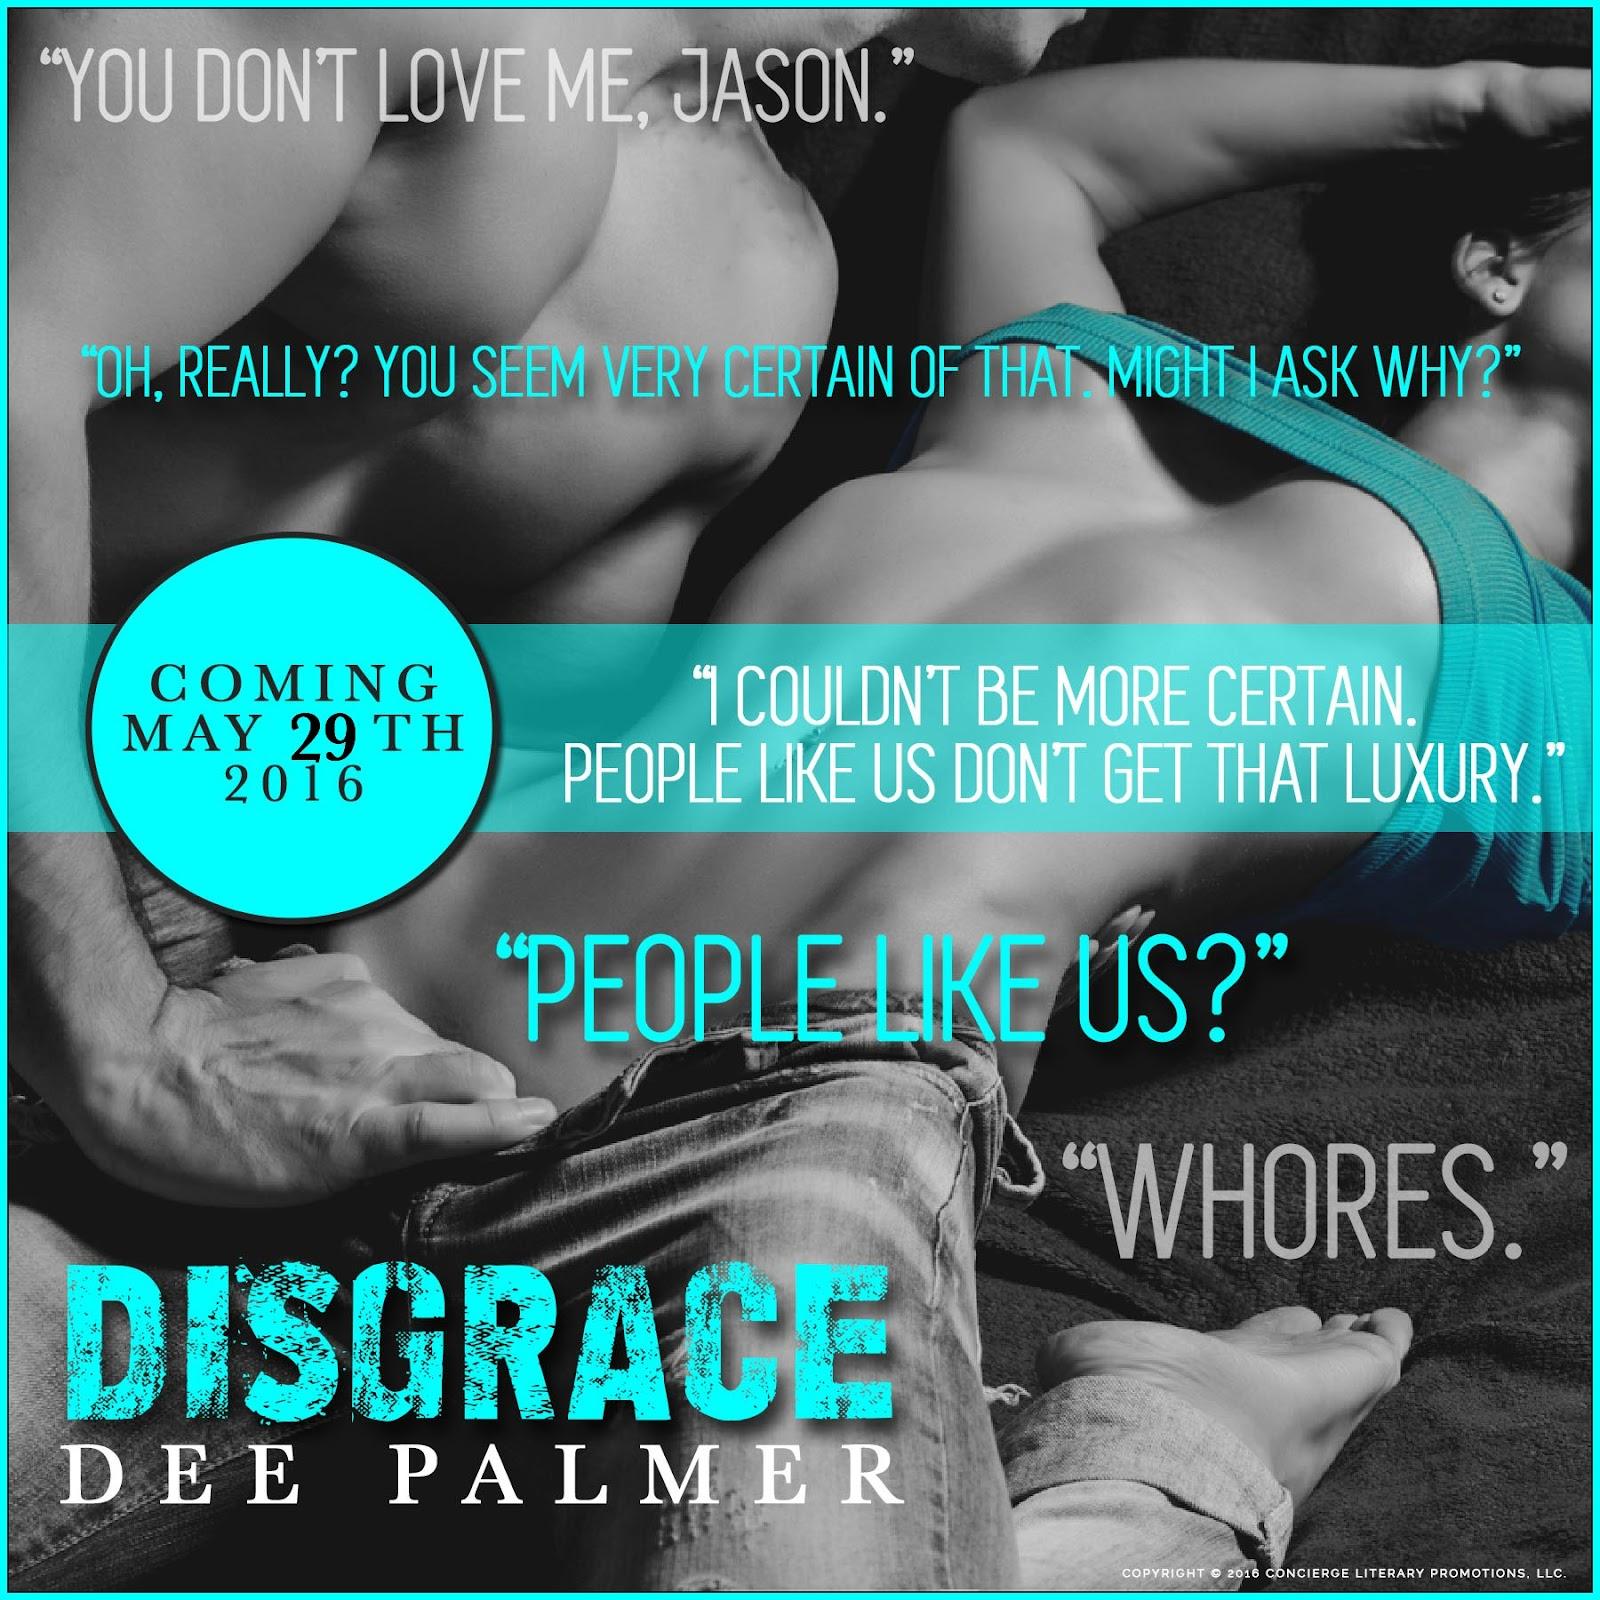 DISGRACE - WHORES TEASER.jpg